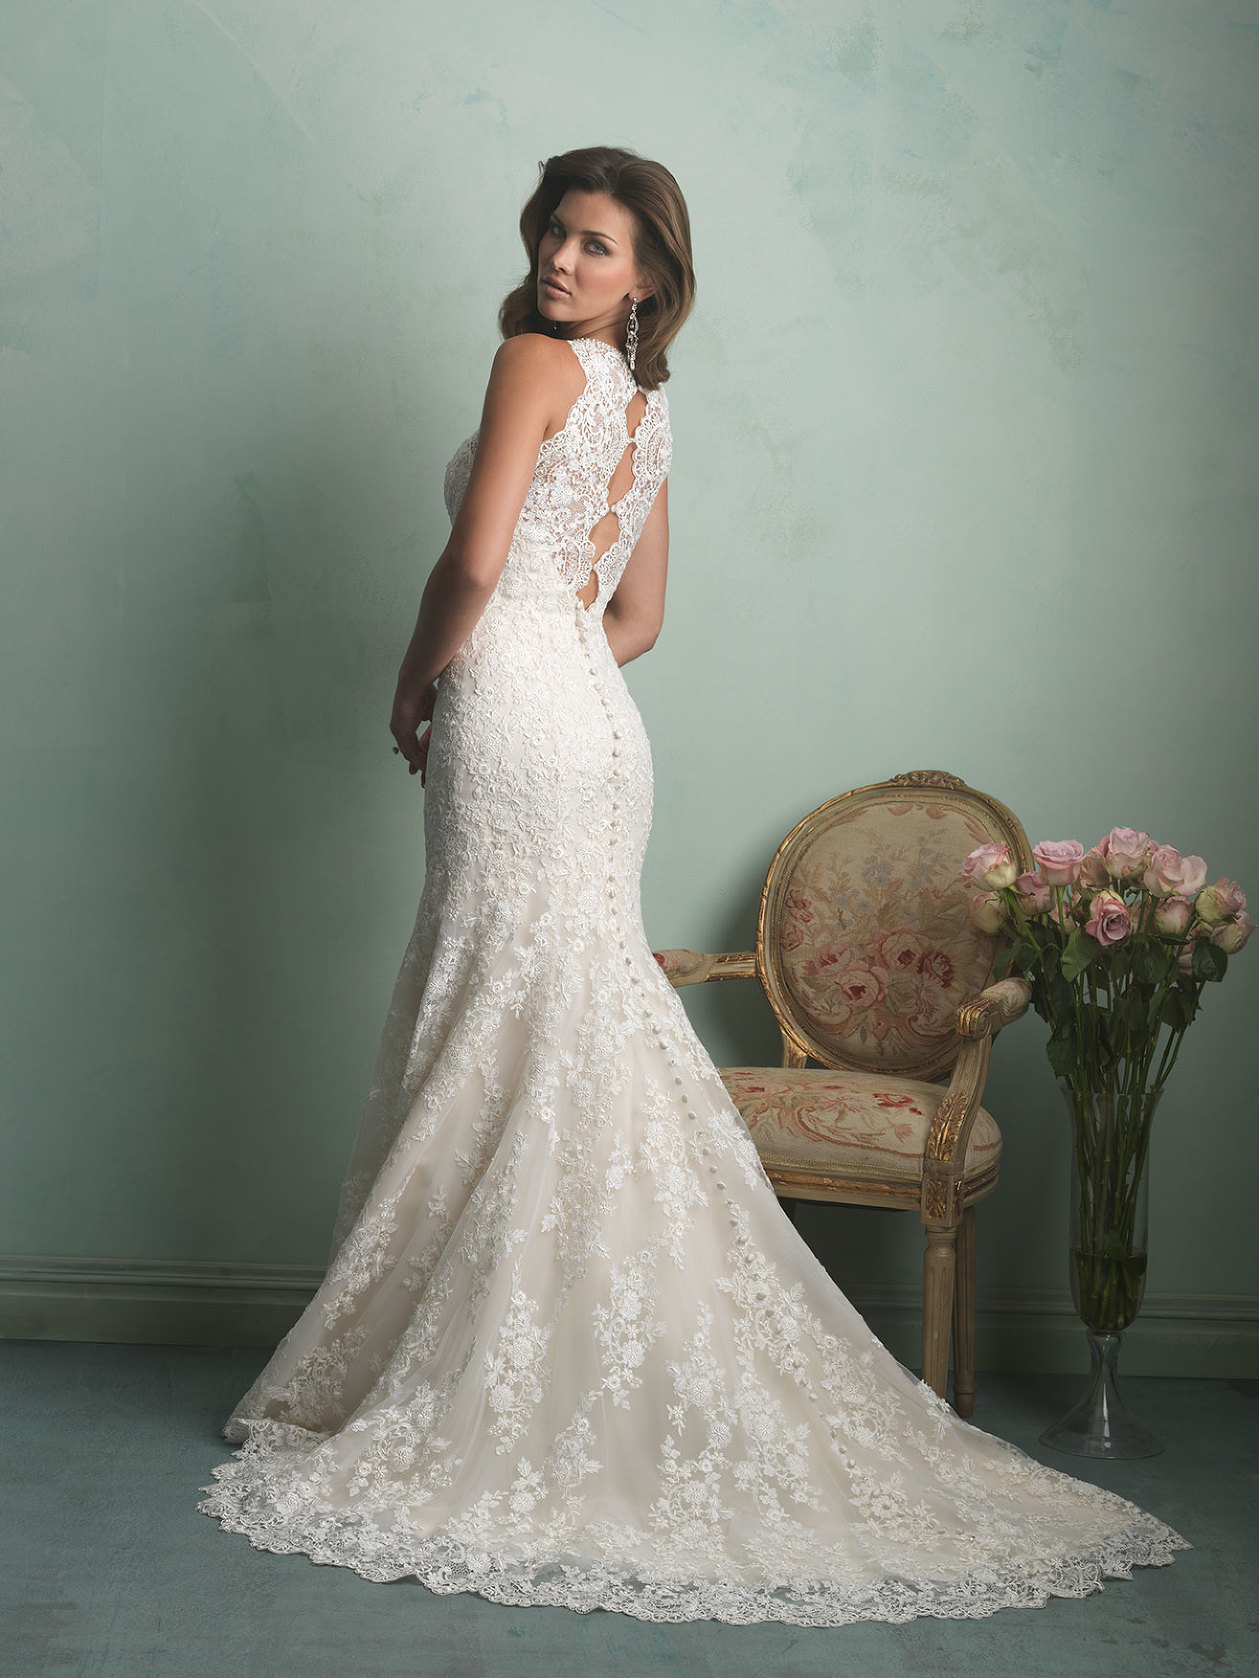 Allure Bridal 9154 {San Angelo Bridal Dress} » Bridal Boutique